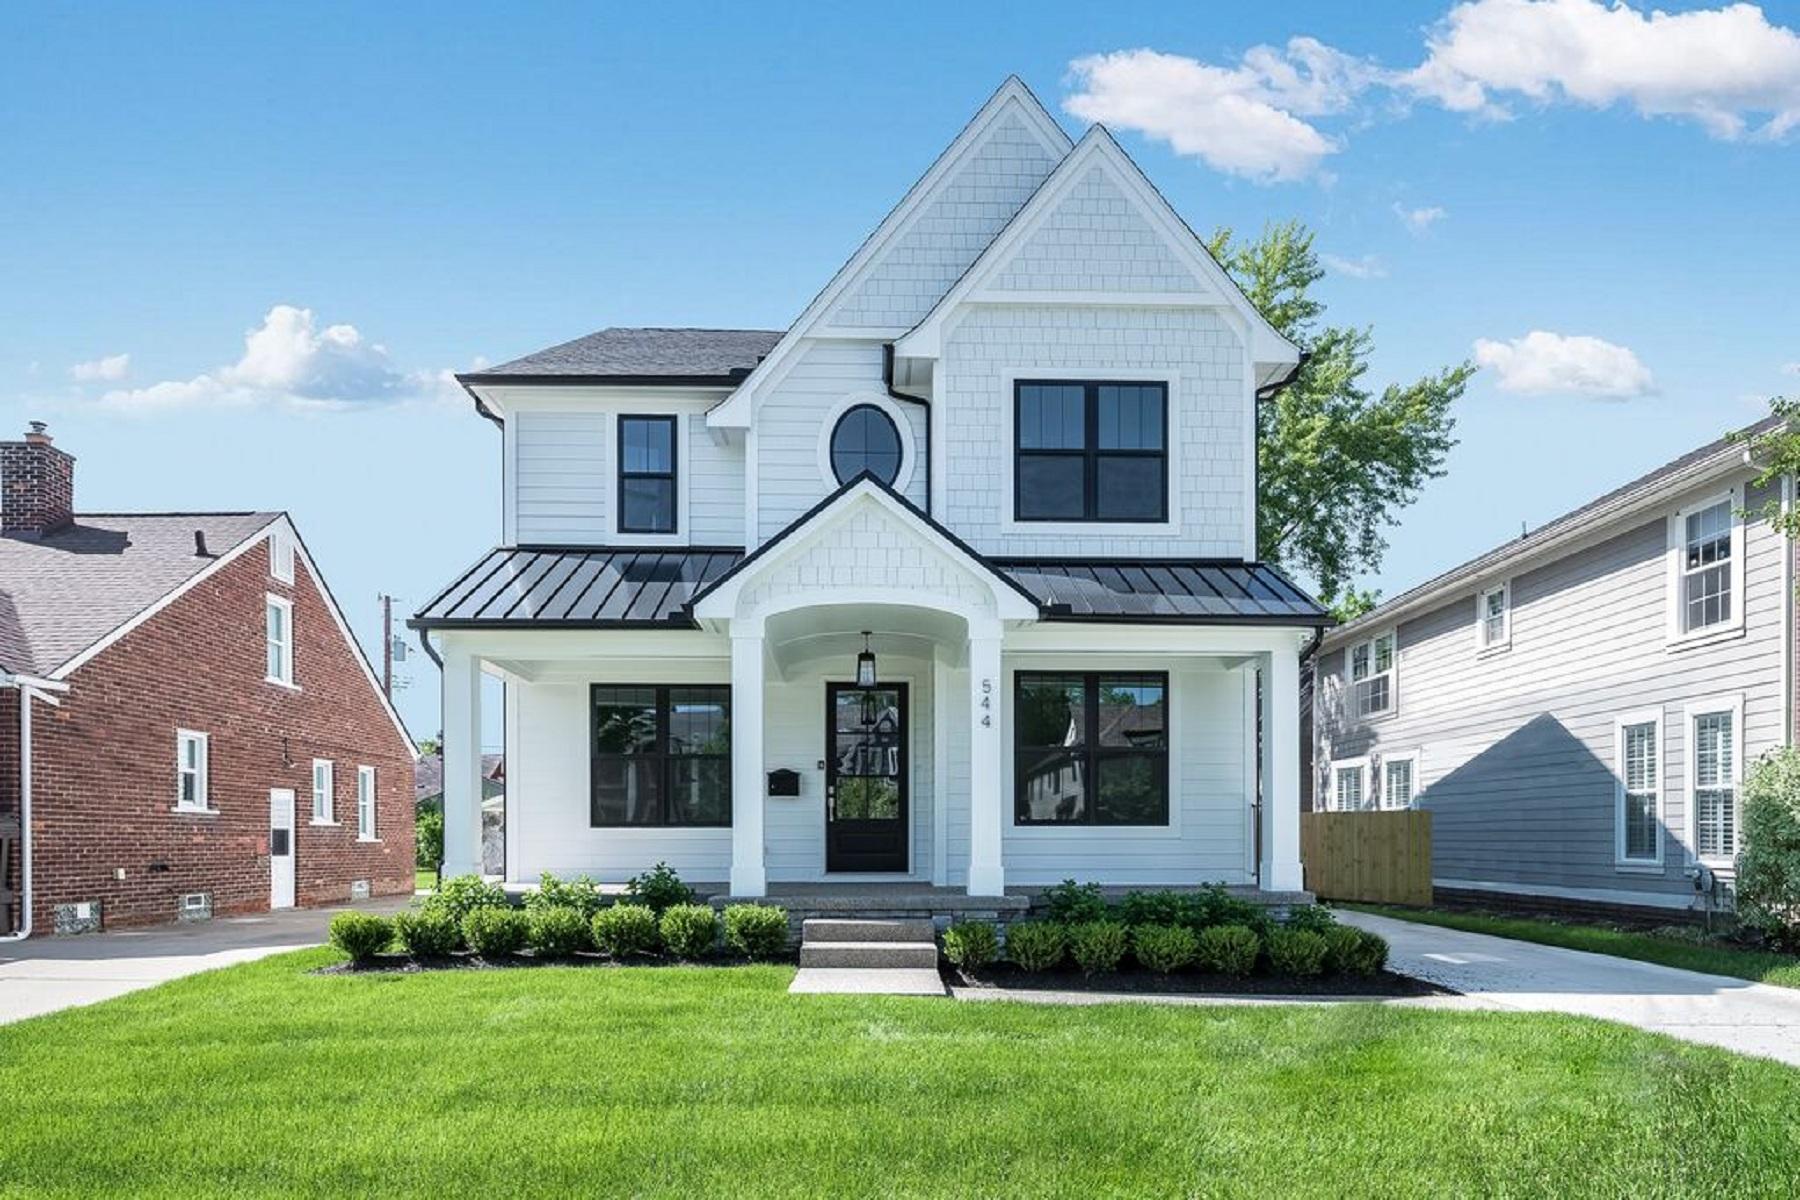 Single Family Homes for Active at Birmingham 544 Catalpa Street Birmingham, Michigan 48009 United States